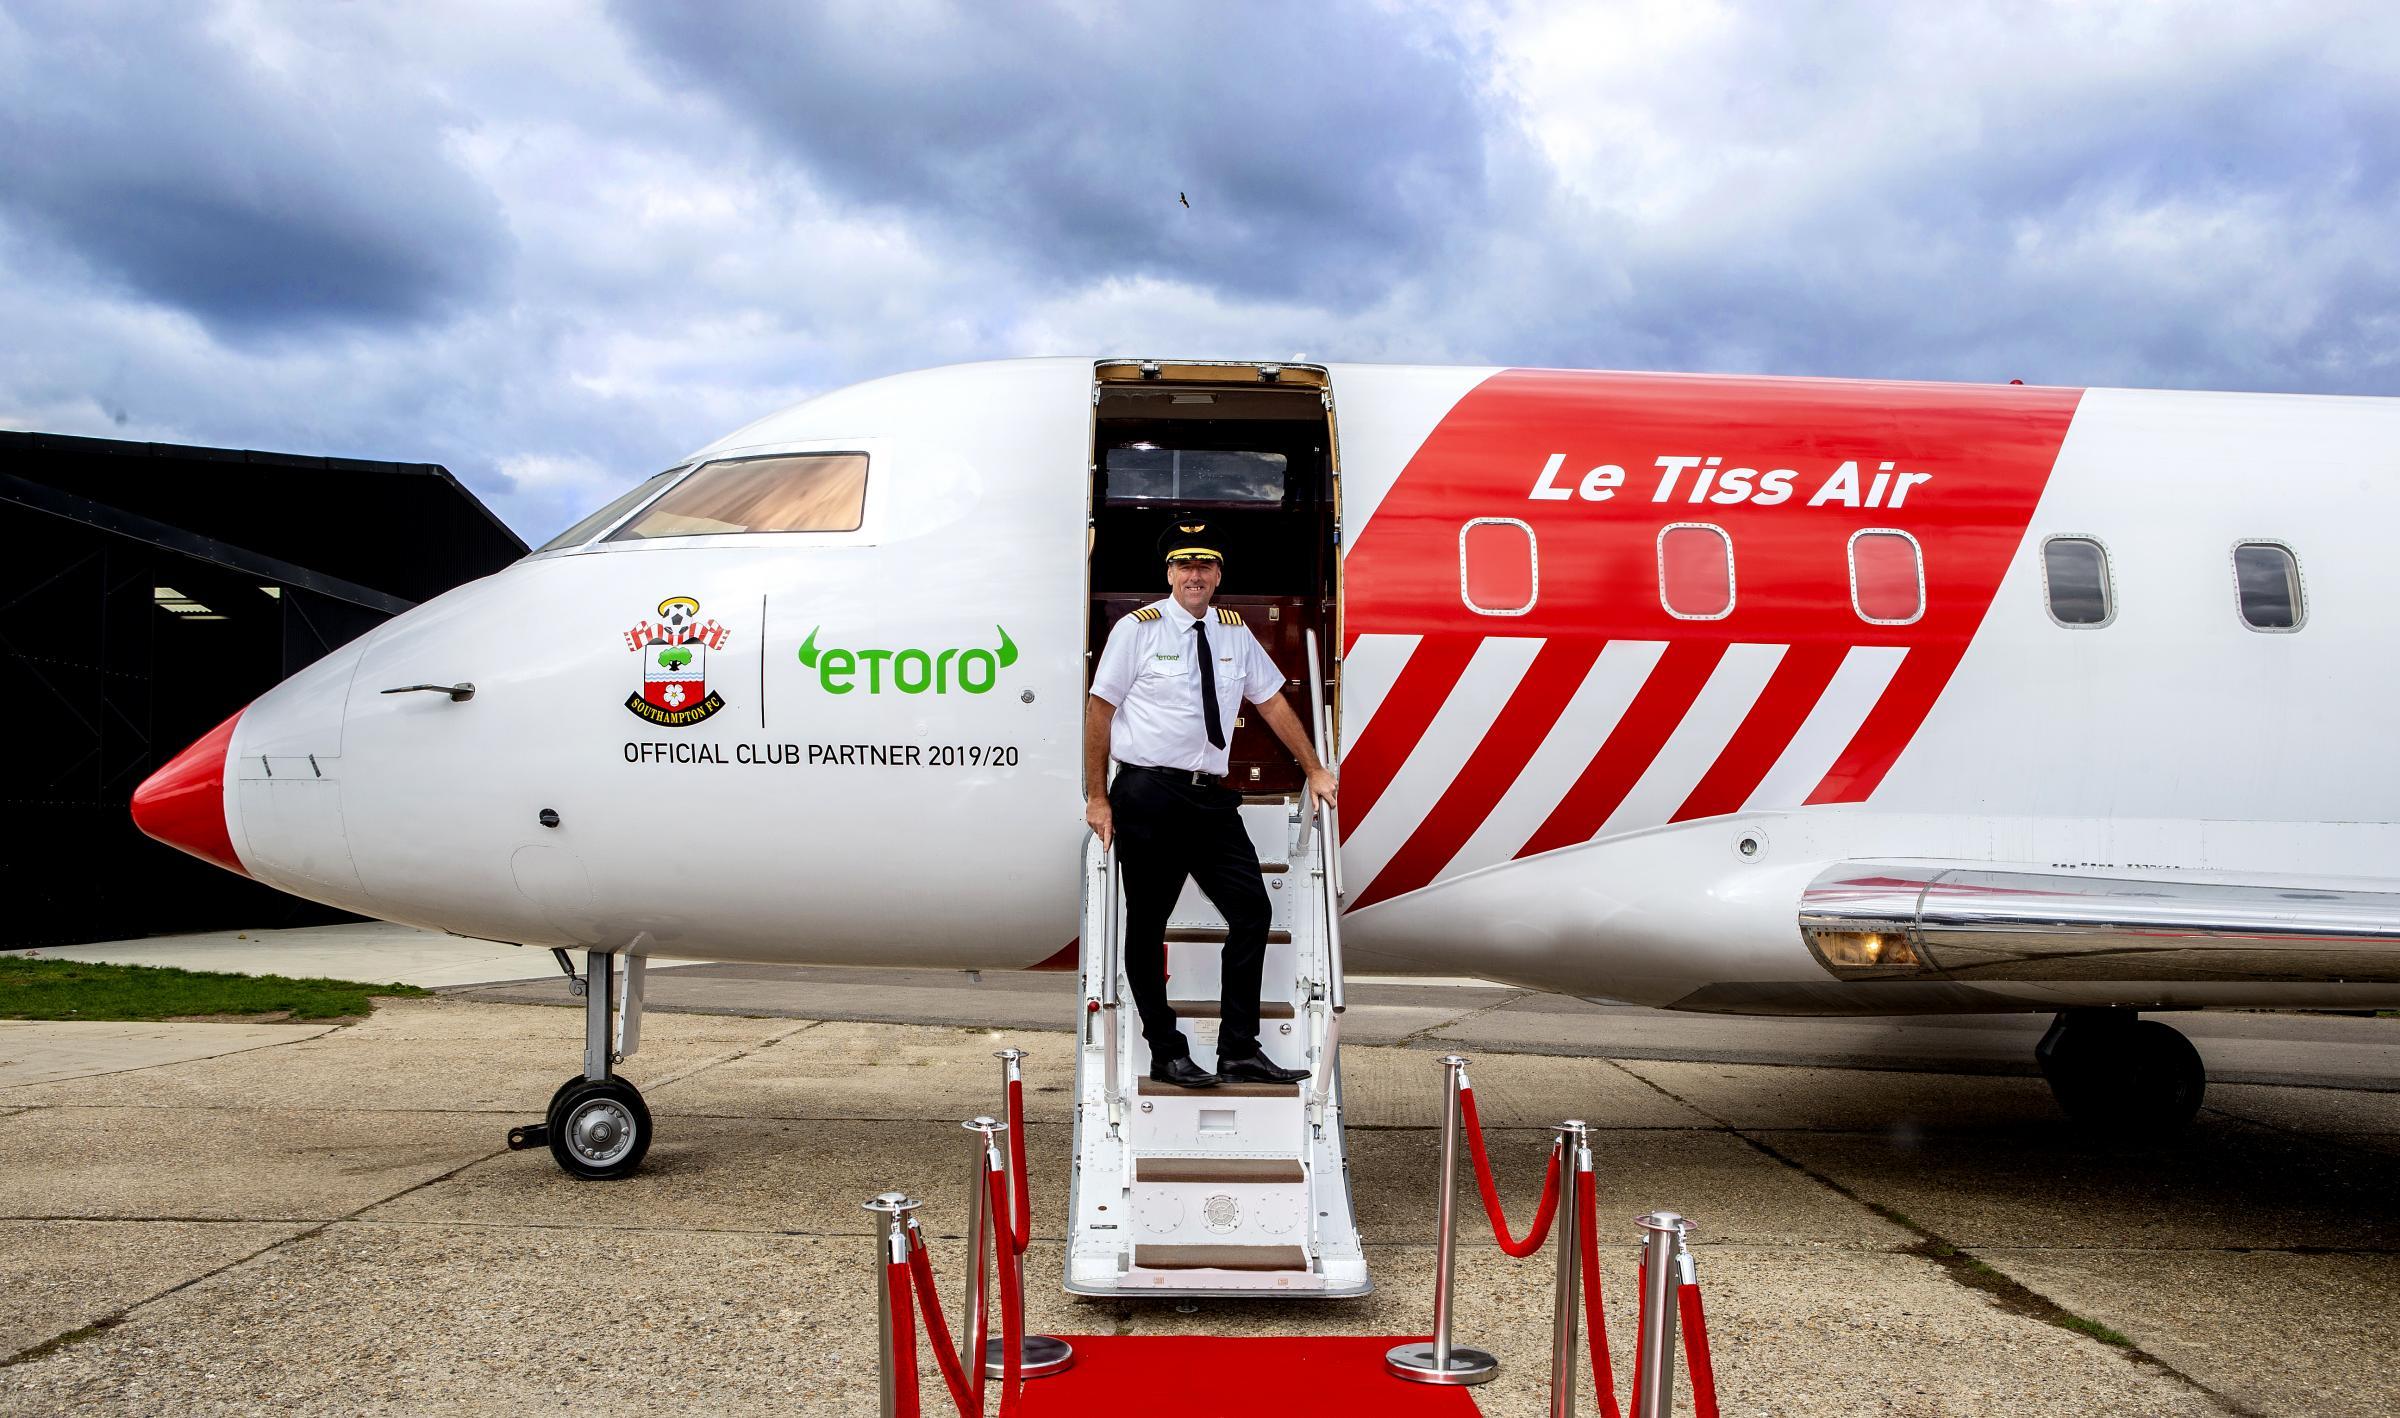 Win return flights and tickets to watch Man City v Southampton